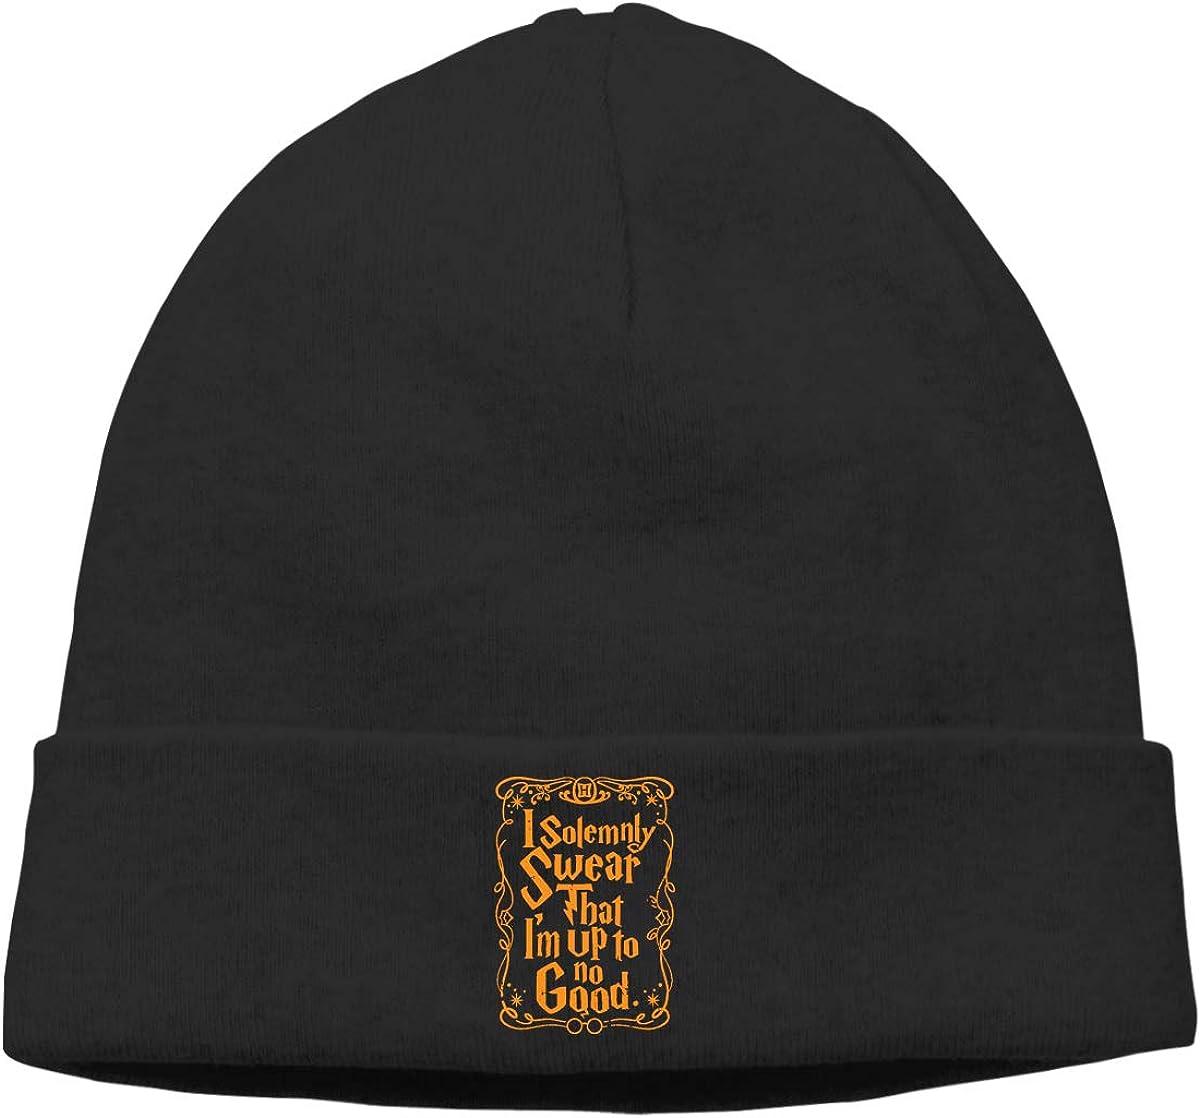 Solemnly Swear That I Am Up to No Good Beanie Hats Cap Men Women Warm Skull Cap Knit Cap Skully